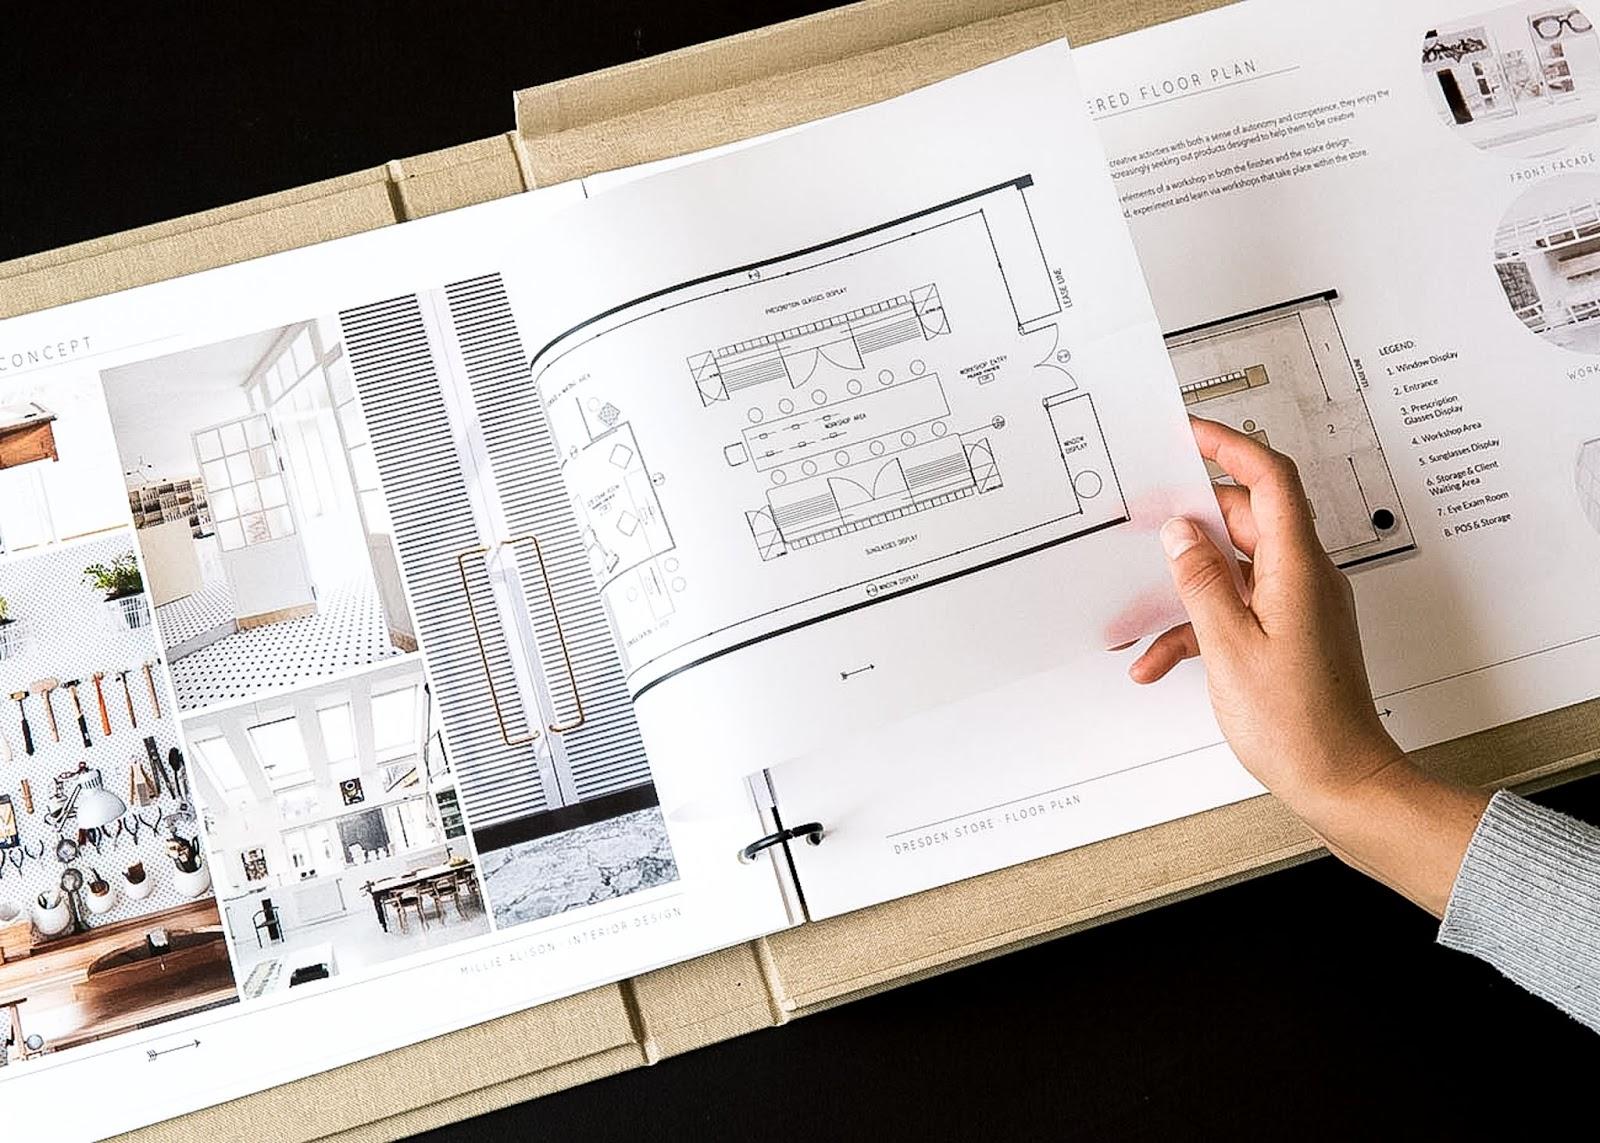 How to run an interior design business amid coronavirus